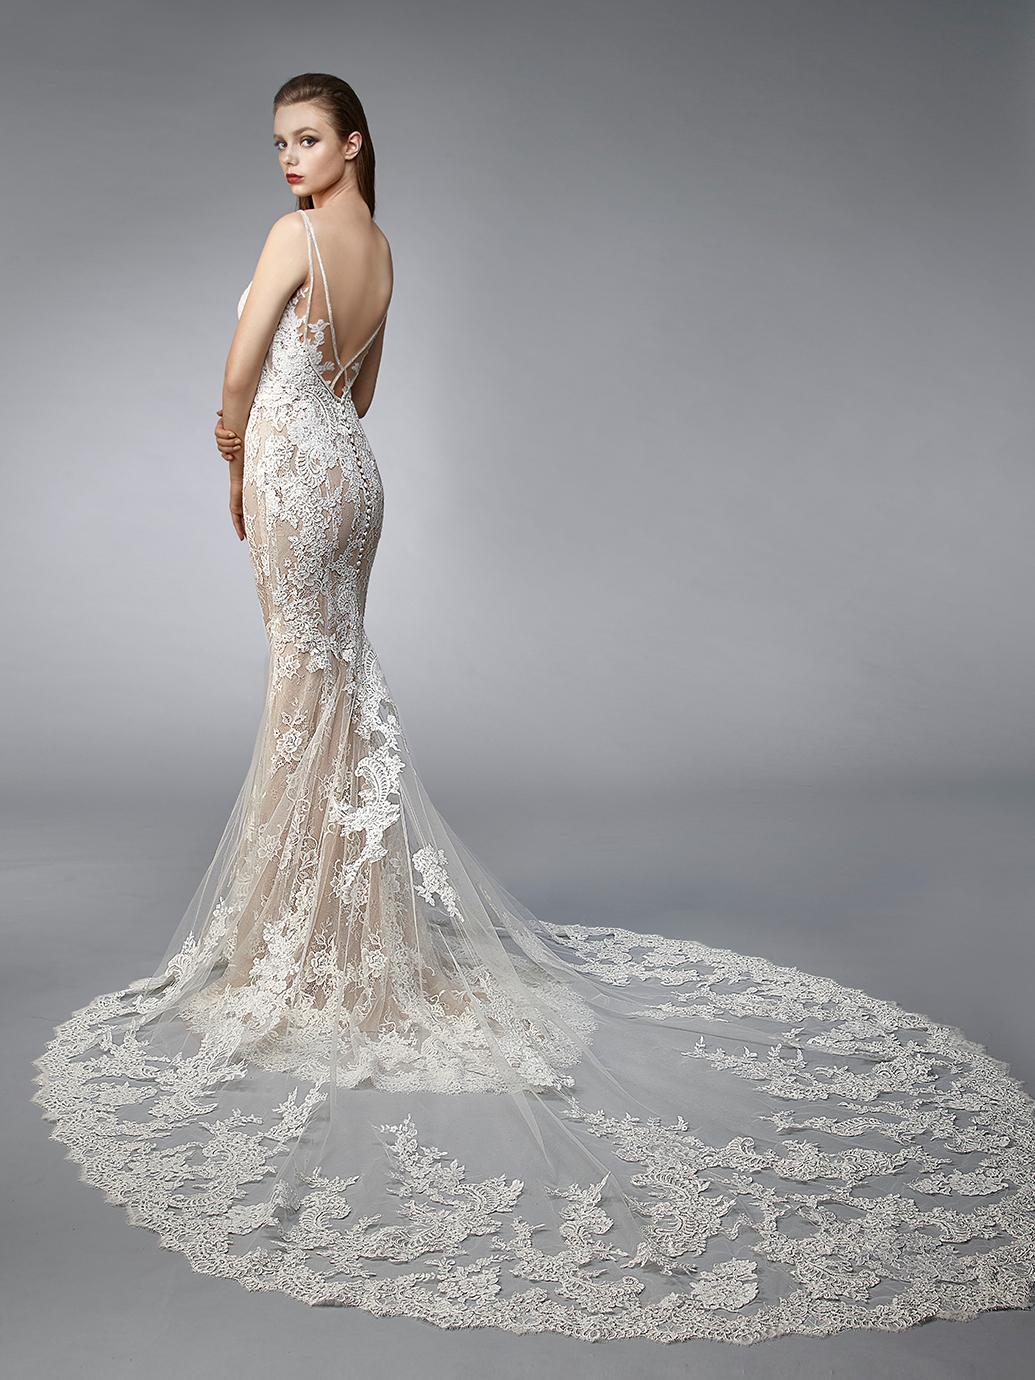 Enzoani Wedding Dress Neve, mermaid wedding dress, sexy back wedding dress, low back wedding dress, v neck wedding dress, sheath wedding dress, mermaid wedding dress